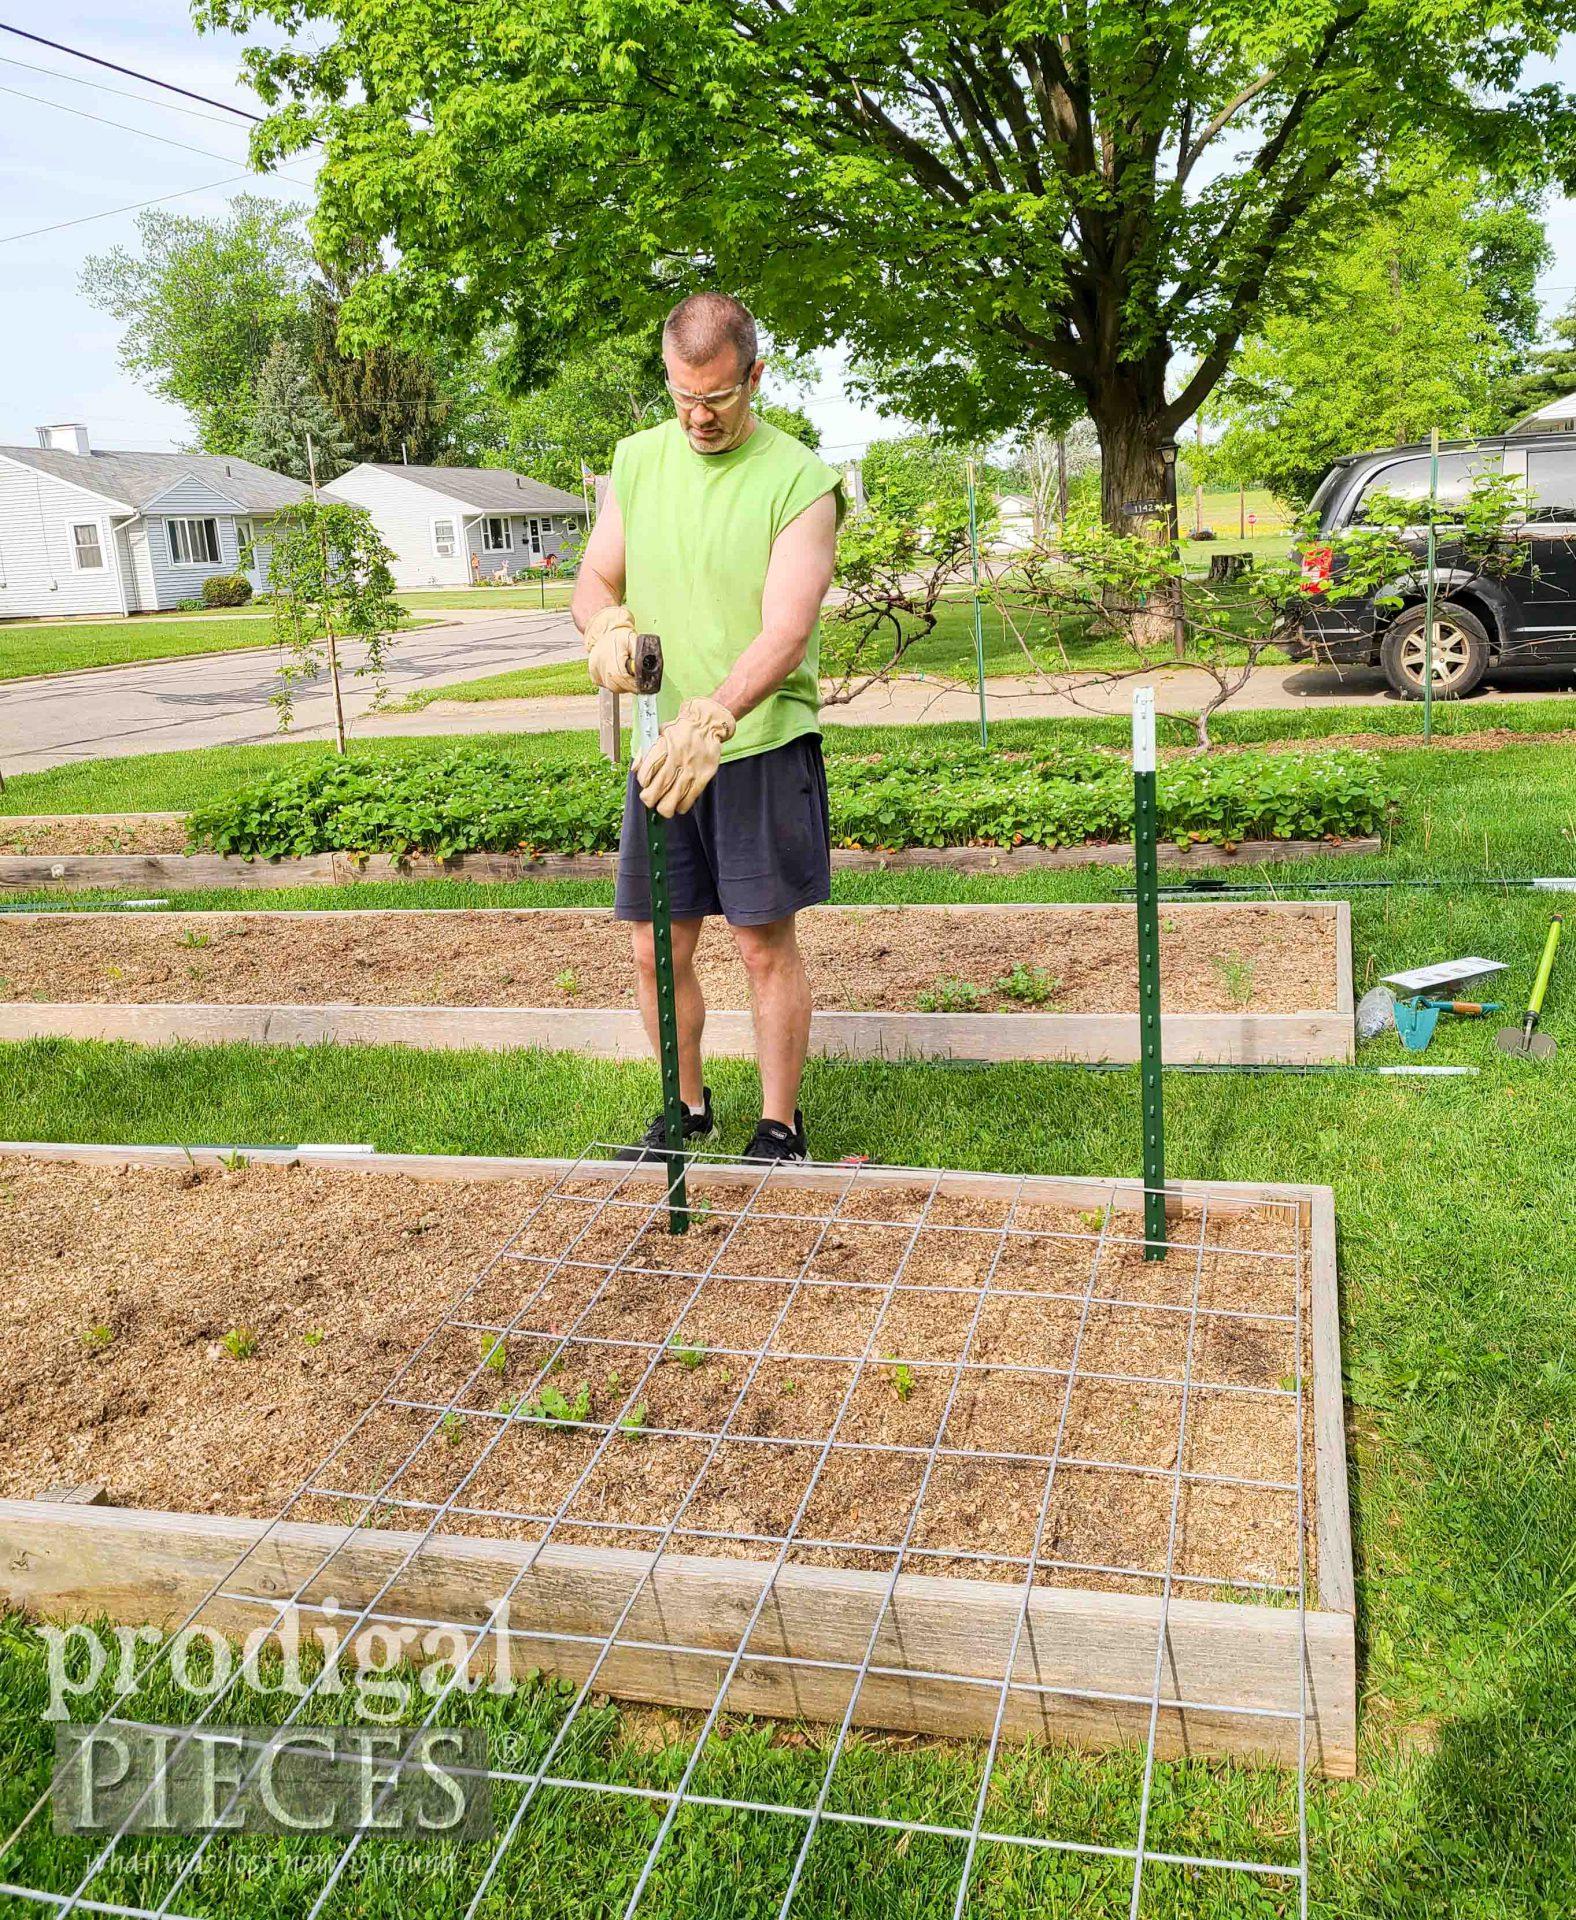 Pounding Garden Stakes for DIY Arched Trellis | prodigalpieces.com #prodigalpieces